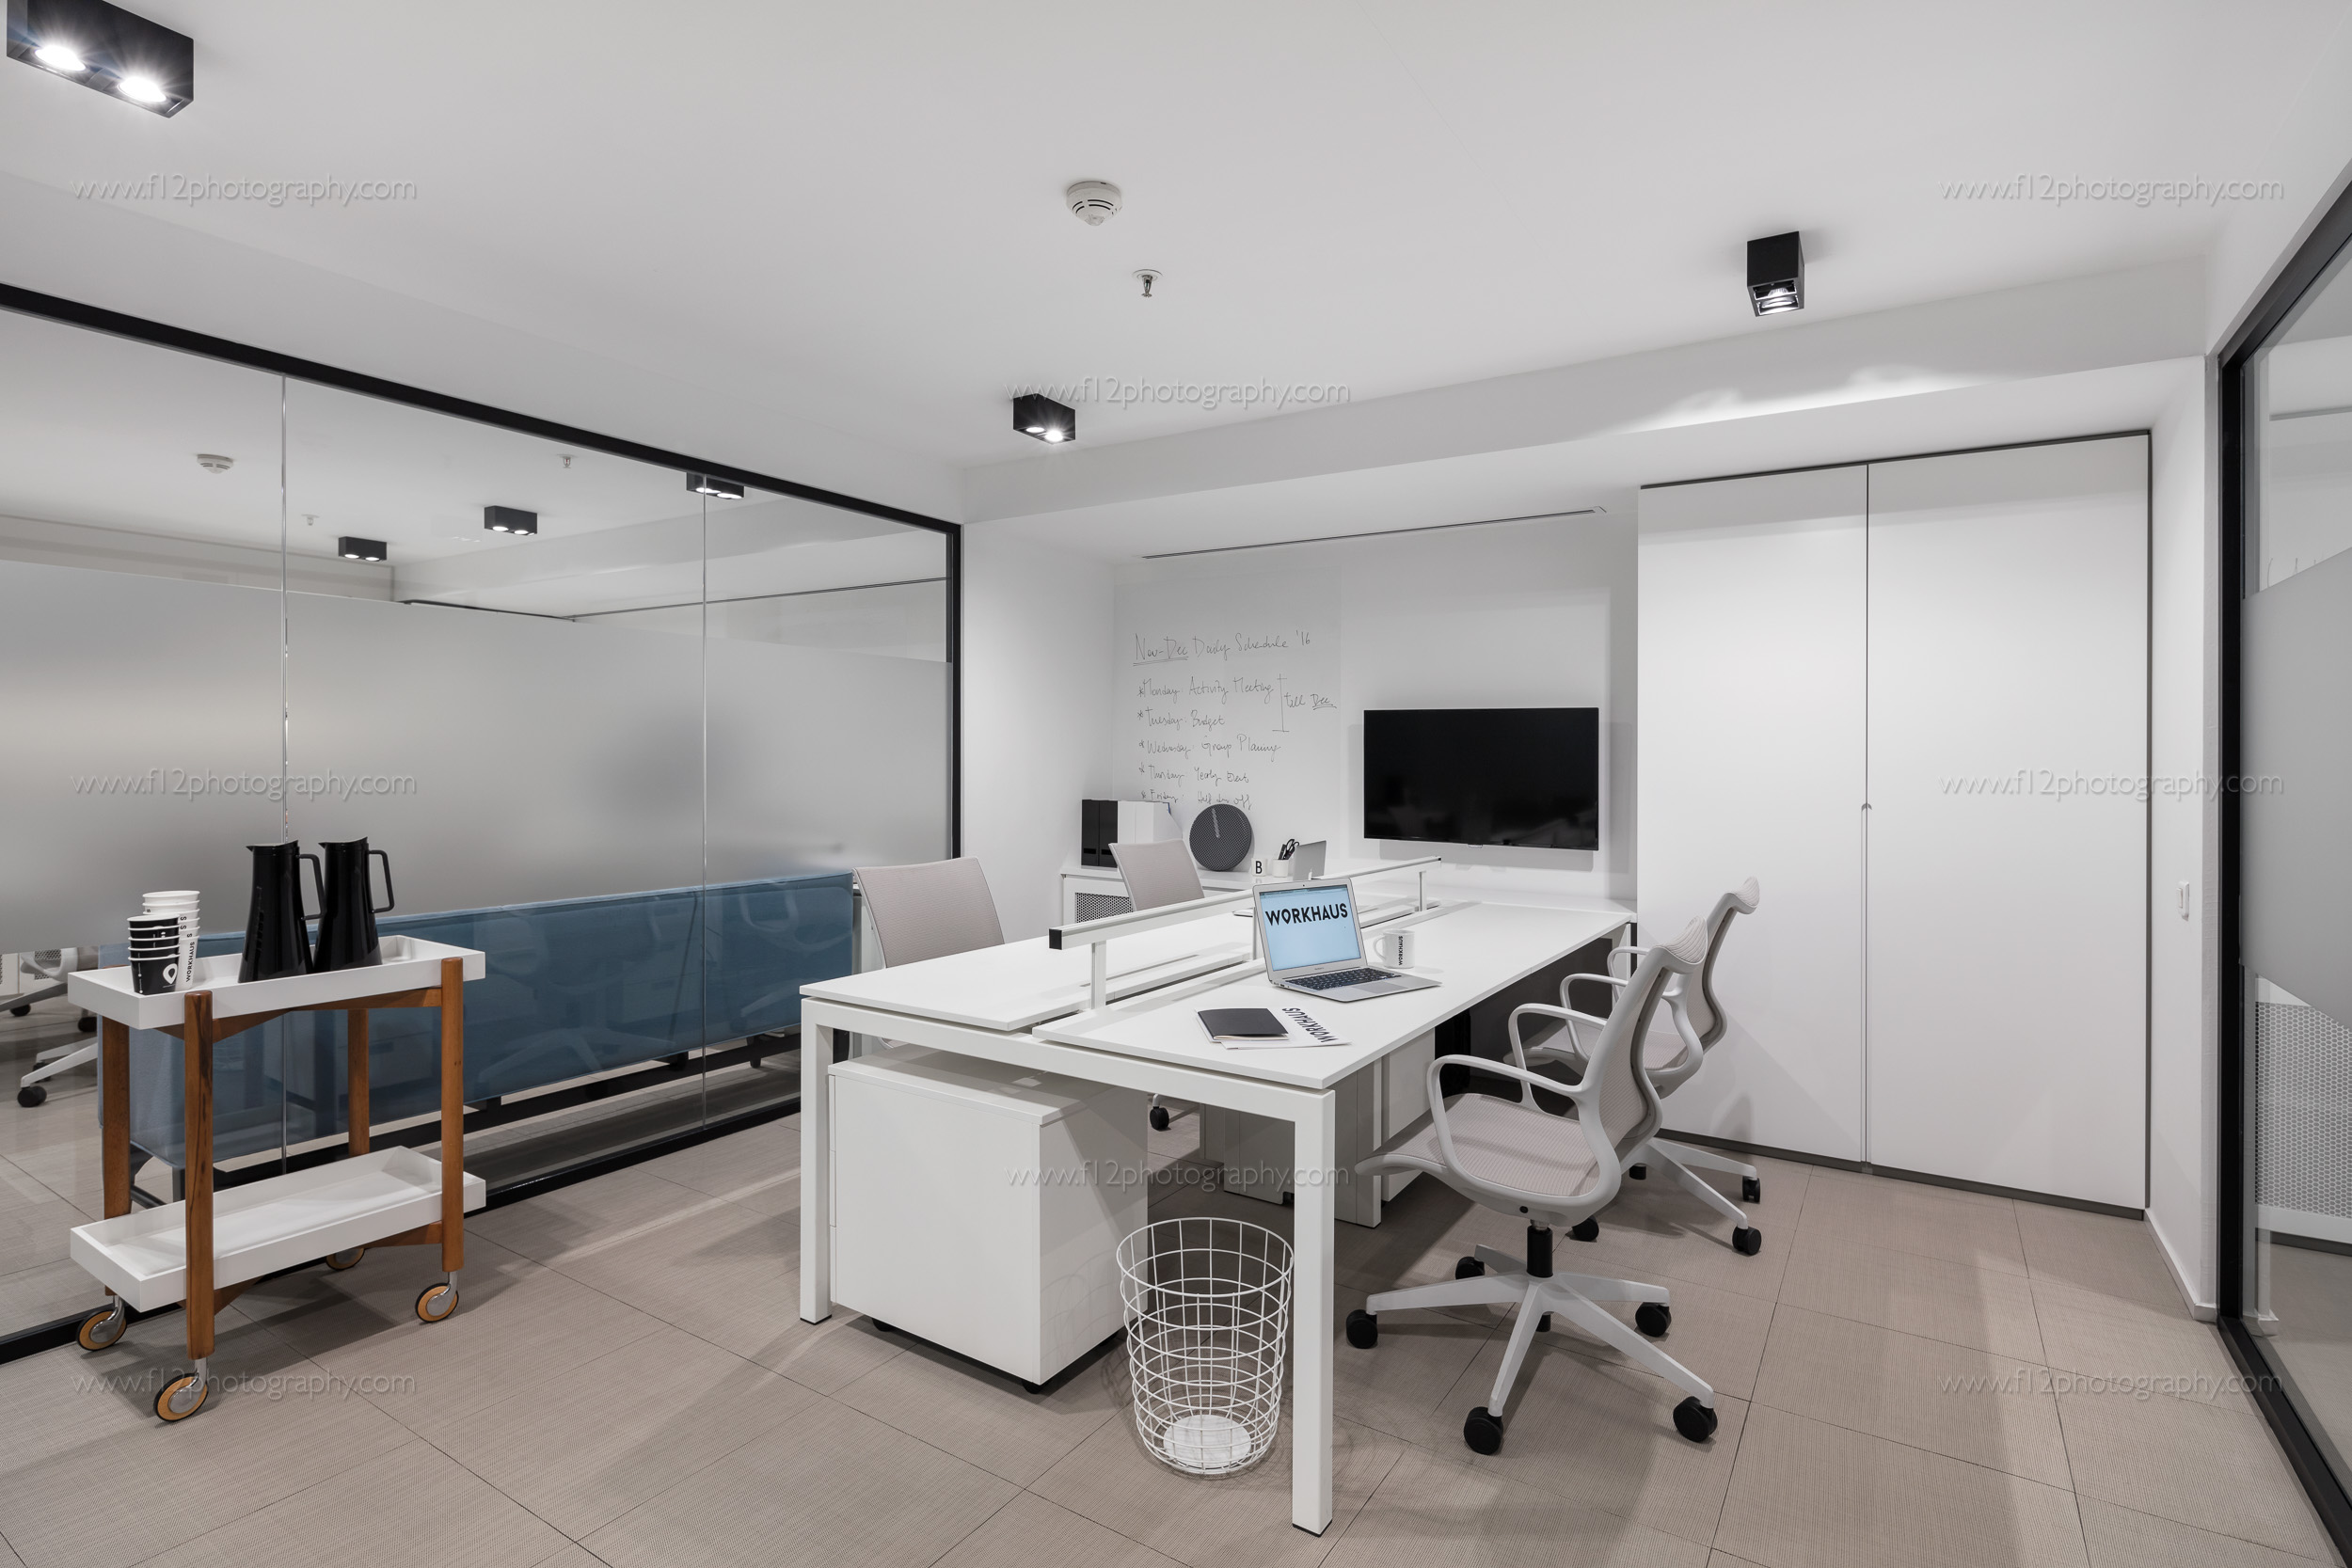 f12-Workhaus-11.jpg